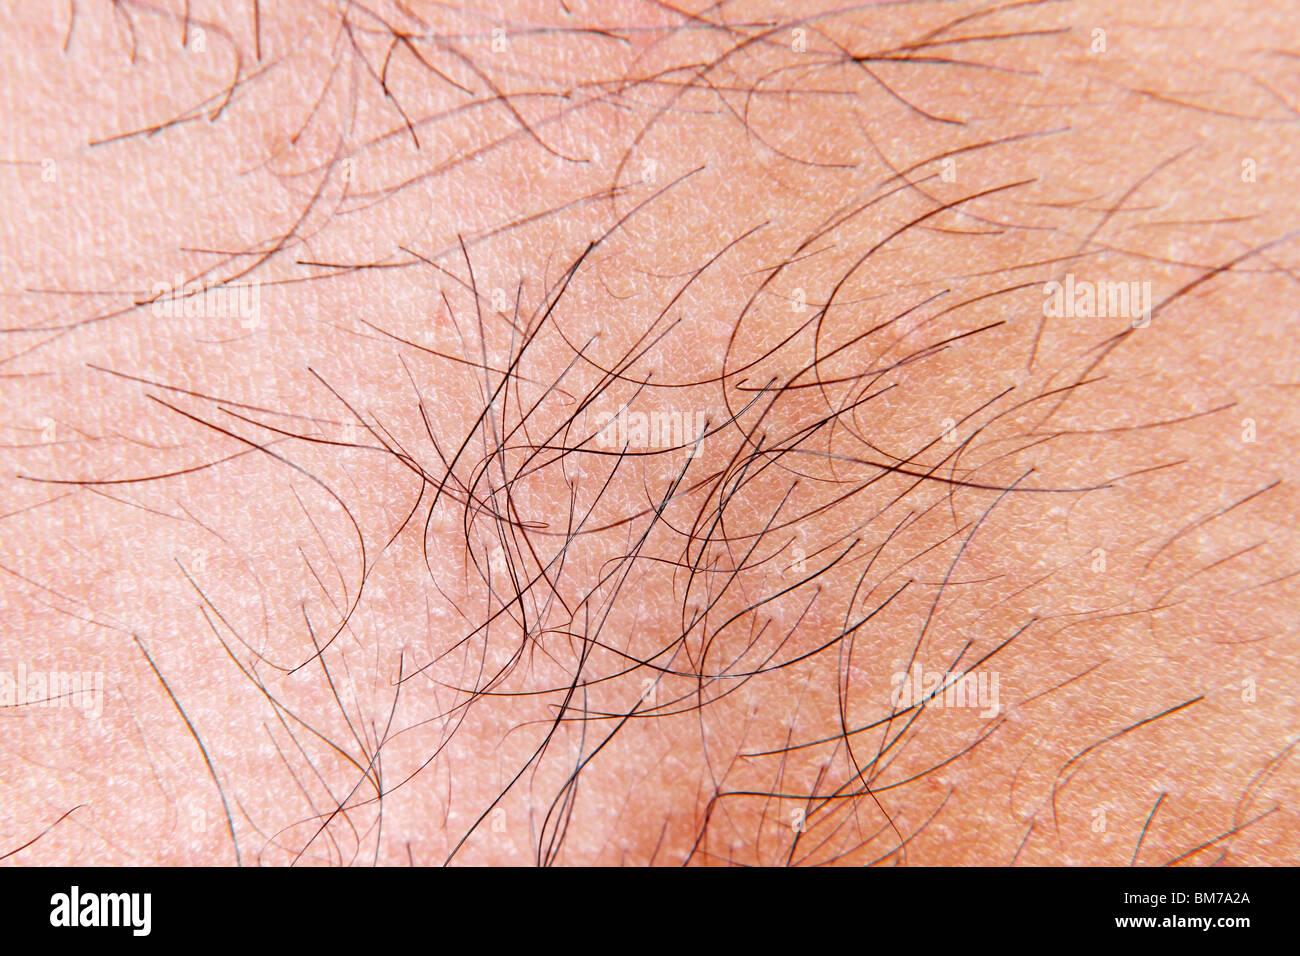 Close-up di pelle umana Immagini Stock